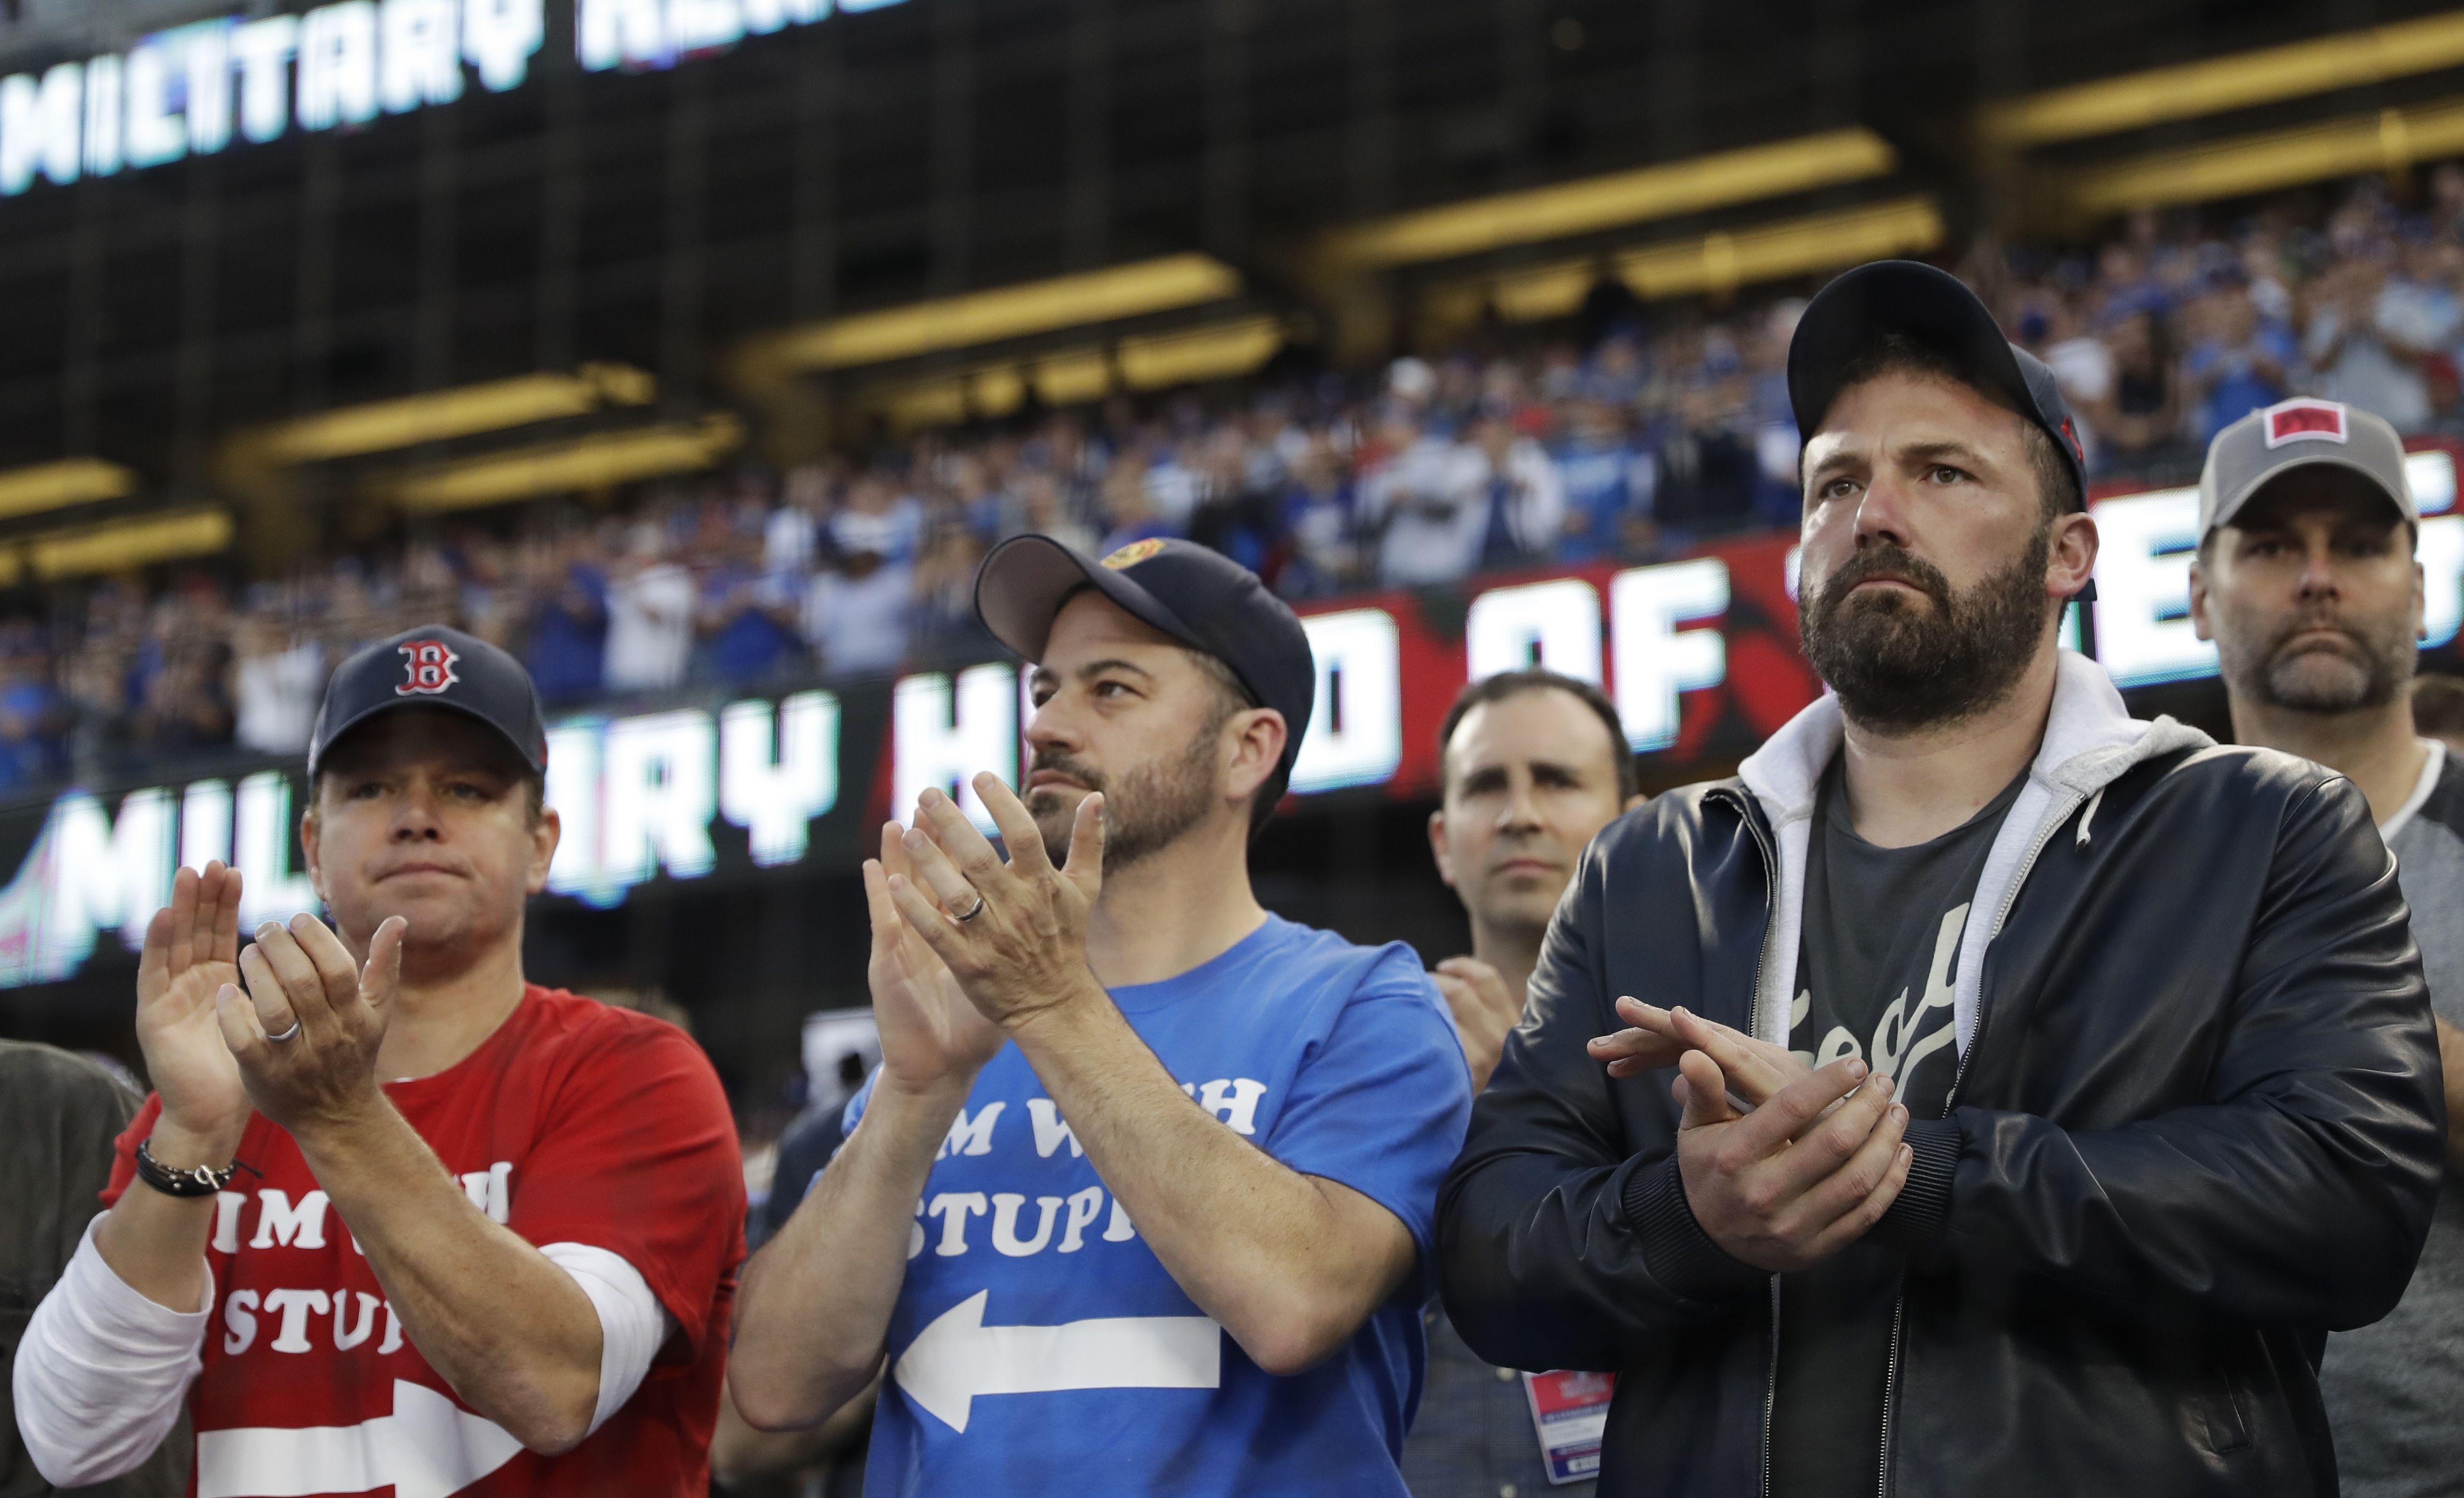 Matt Damon Ben Affleck And Jimmy Kimmel In The House For Game 5 Of The World Series The Boston Globe Ben Affleck World Series Red Sox Nation